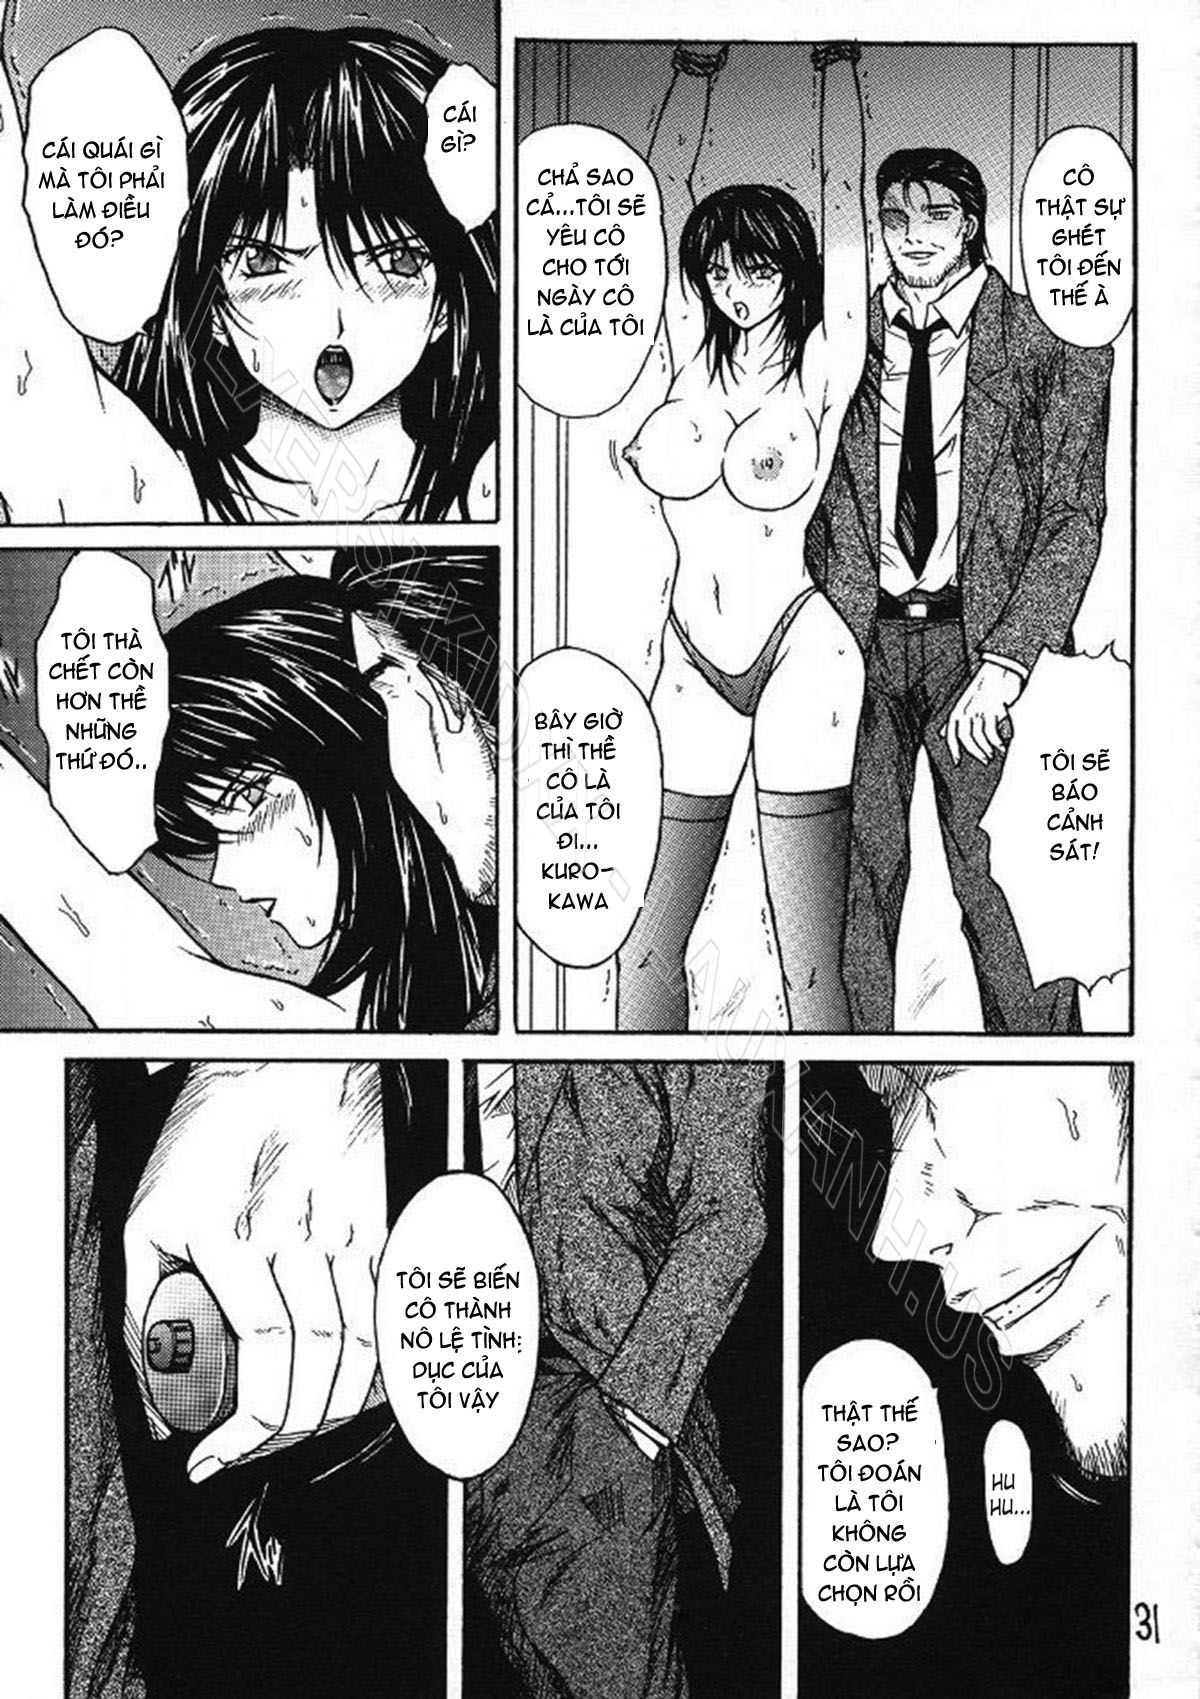 TruyenHay.Com - Ảnh 30 - Ryoujoku Rensa Chapter 2